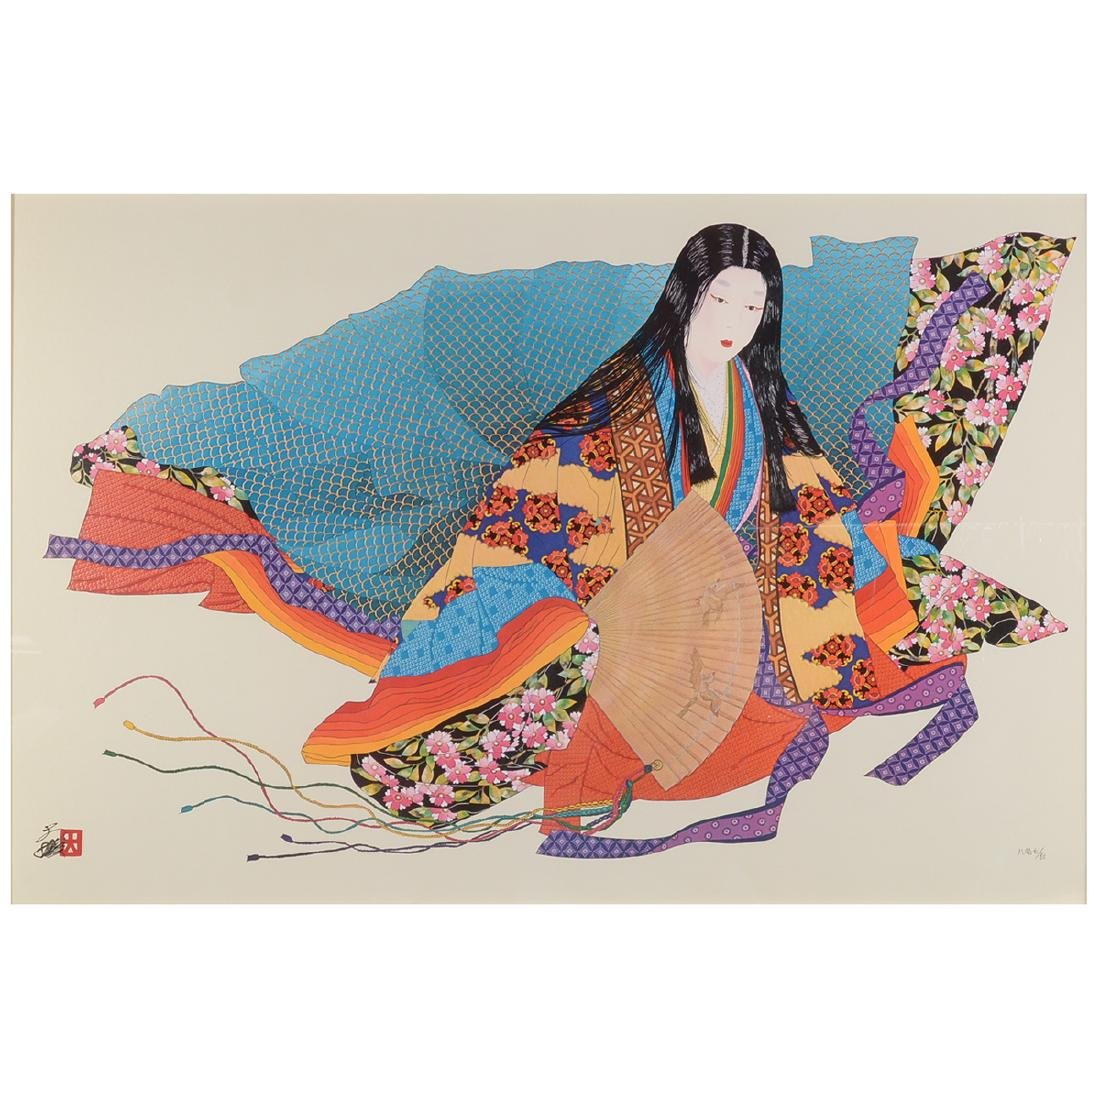 Hisashi Otsuka (b. 1947): The 36th Poetess